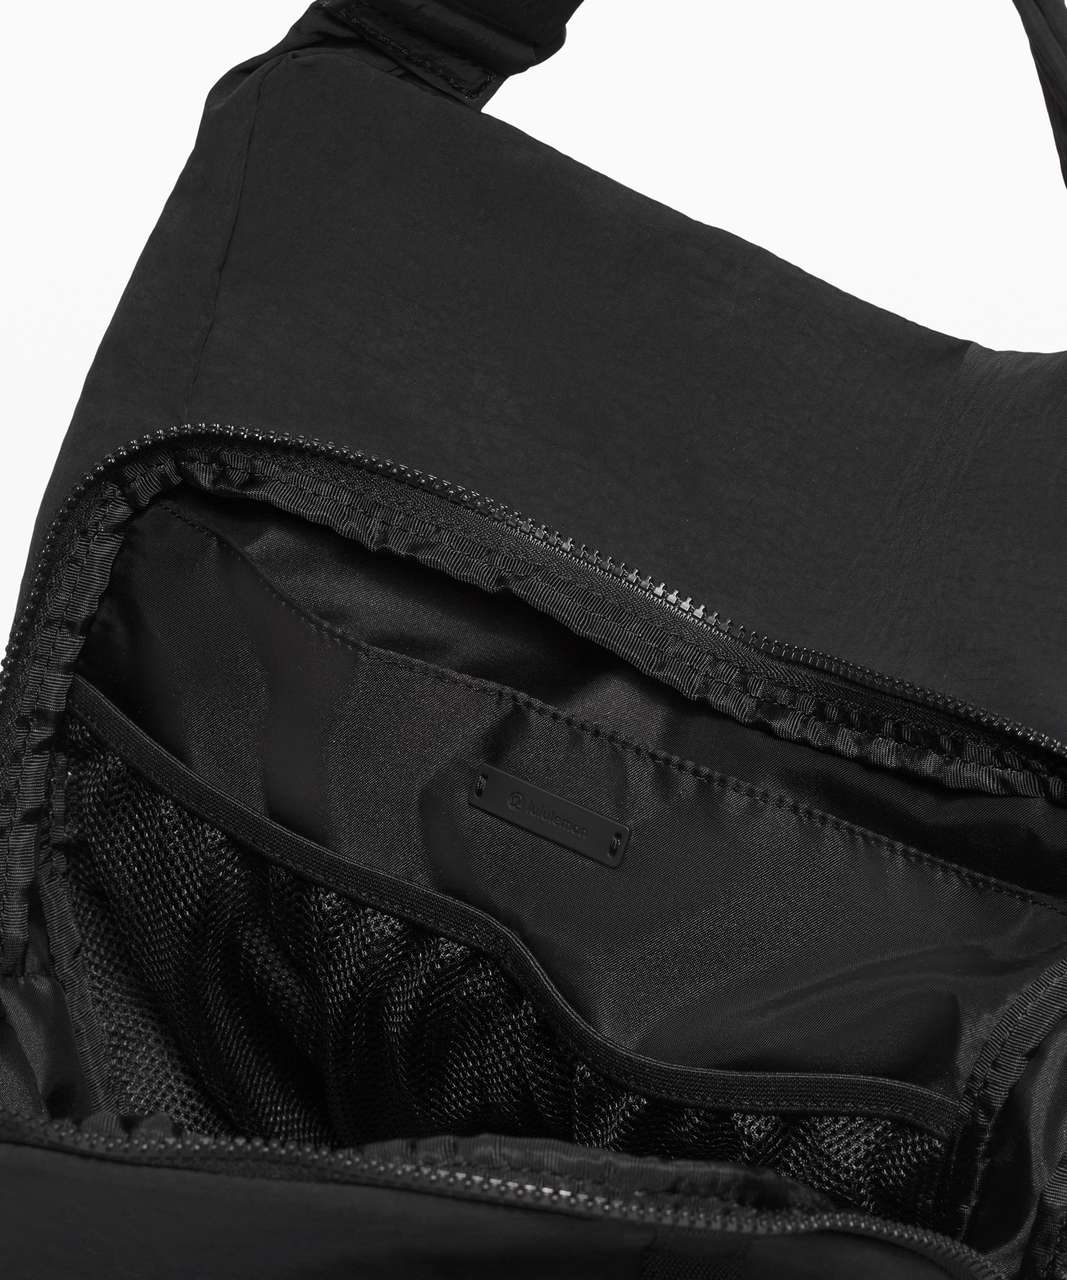 Lululemon Pack and Go Backpack - Black